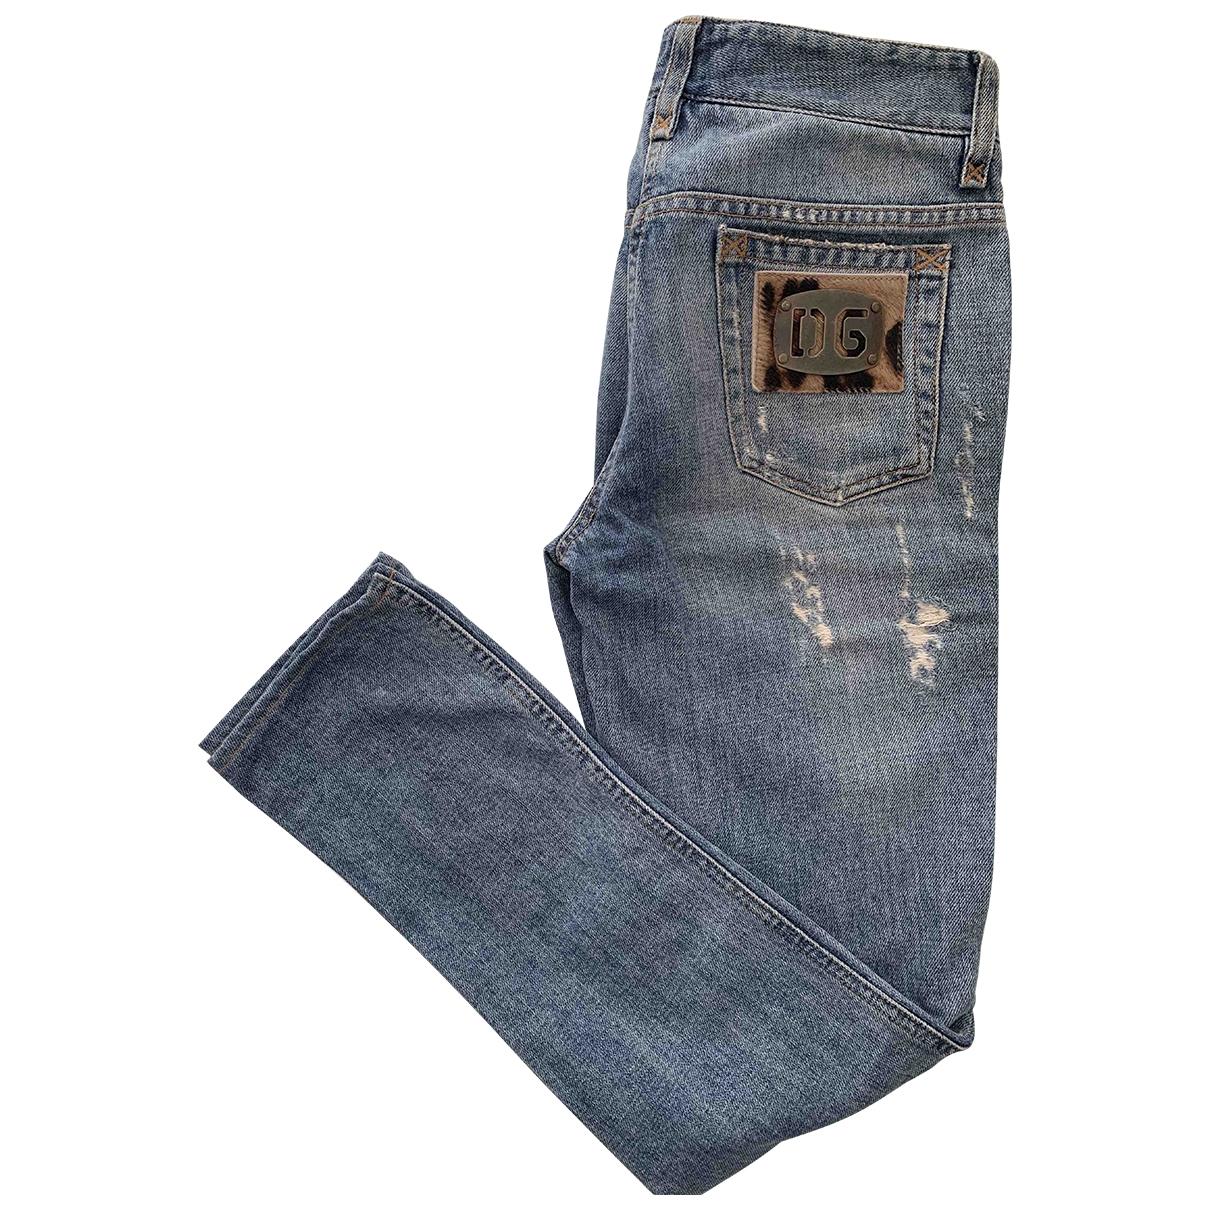 Dolce & Gabbana \N Blue Denim - Jeans Jeans for Women 36 FR